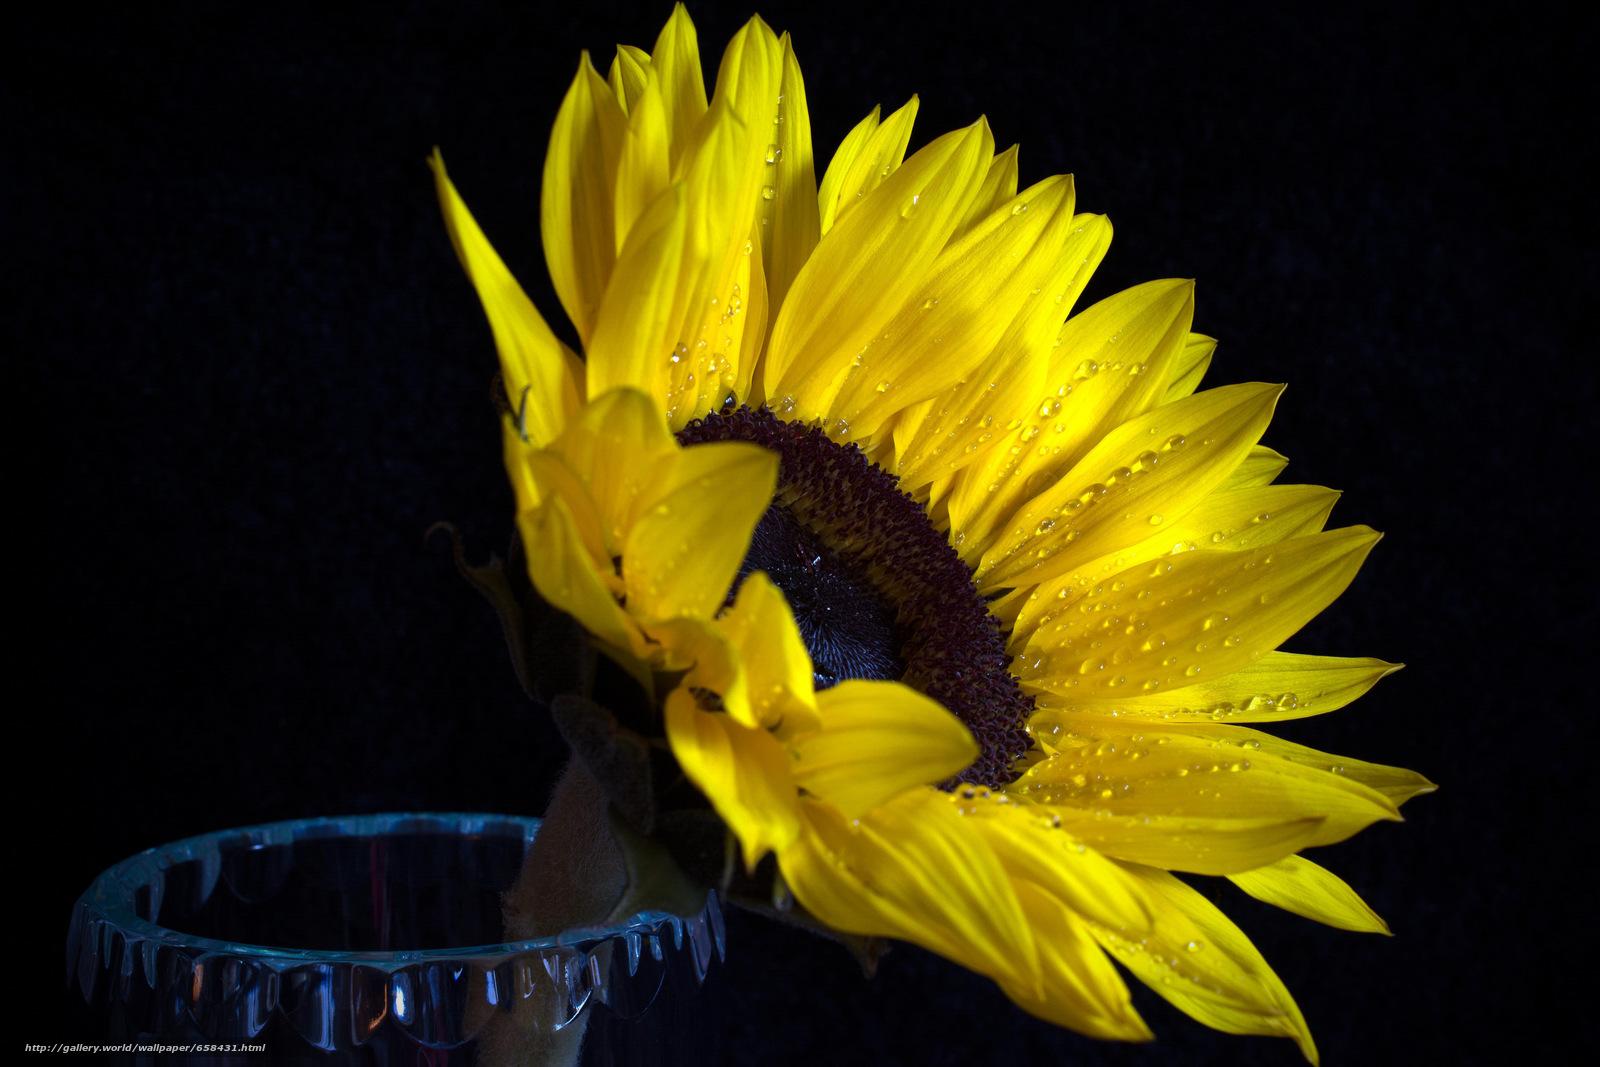 Download wallpaper flower,  Flowers,  flora free desktop wallpaper in the resolution 6000x4000 — picture №658431